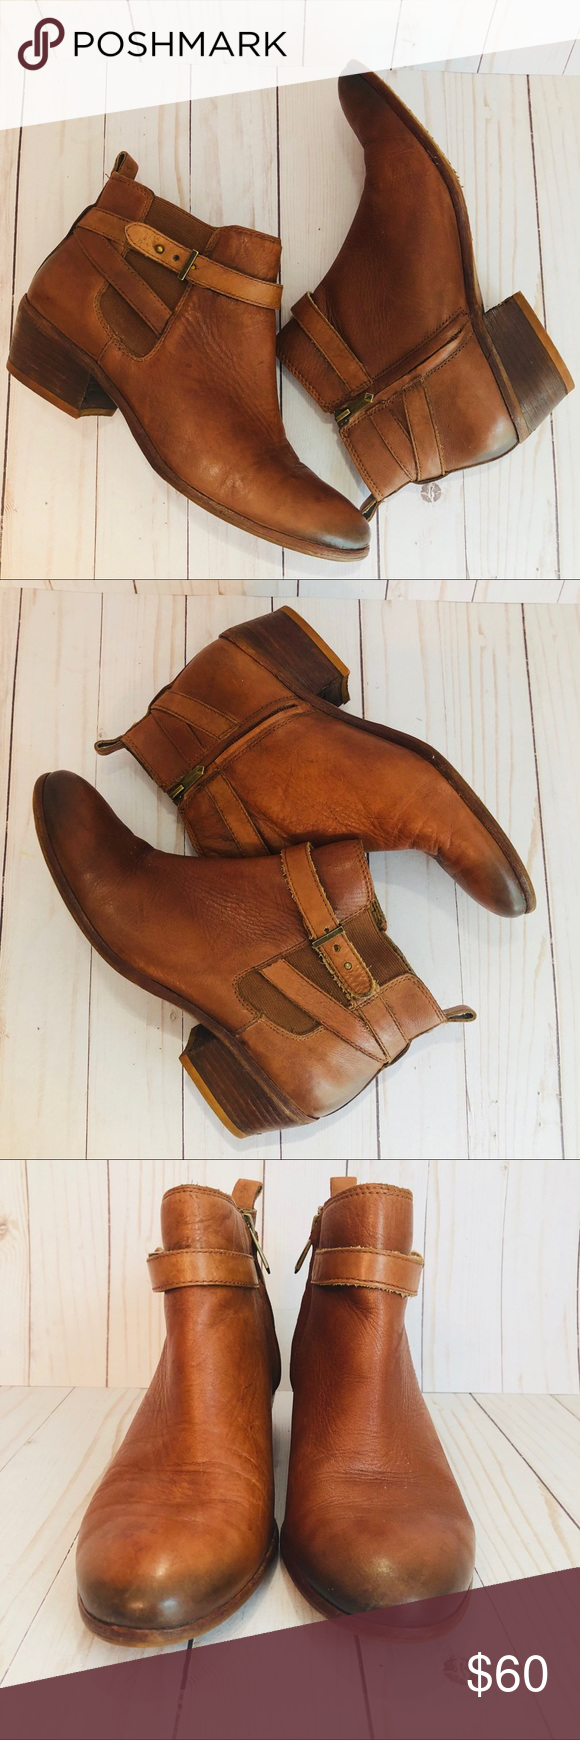 "1e2b76a52b6a Sam Edelman Pacific Wrap Around Booties Sam Edelman Pacific Ankle Boots  Push Stud Wrap Around Detail Inside Zipper Distressed Whiskey Color 1 1 2""  Heel ..."